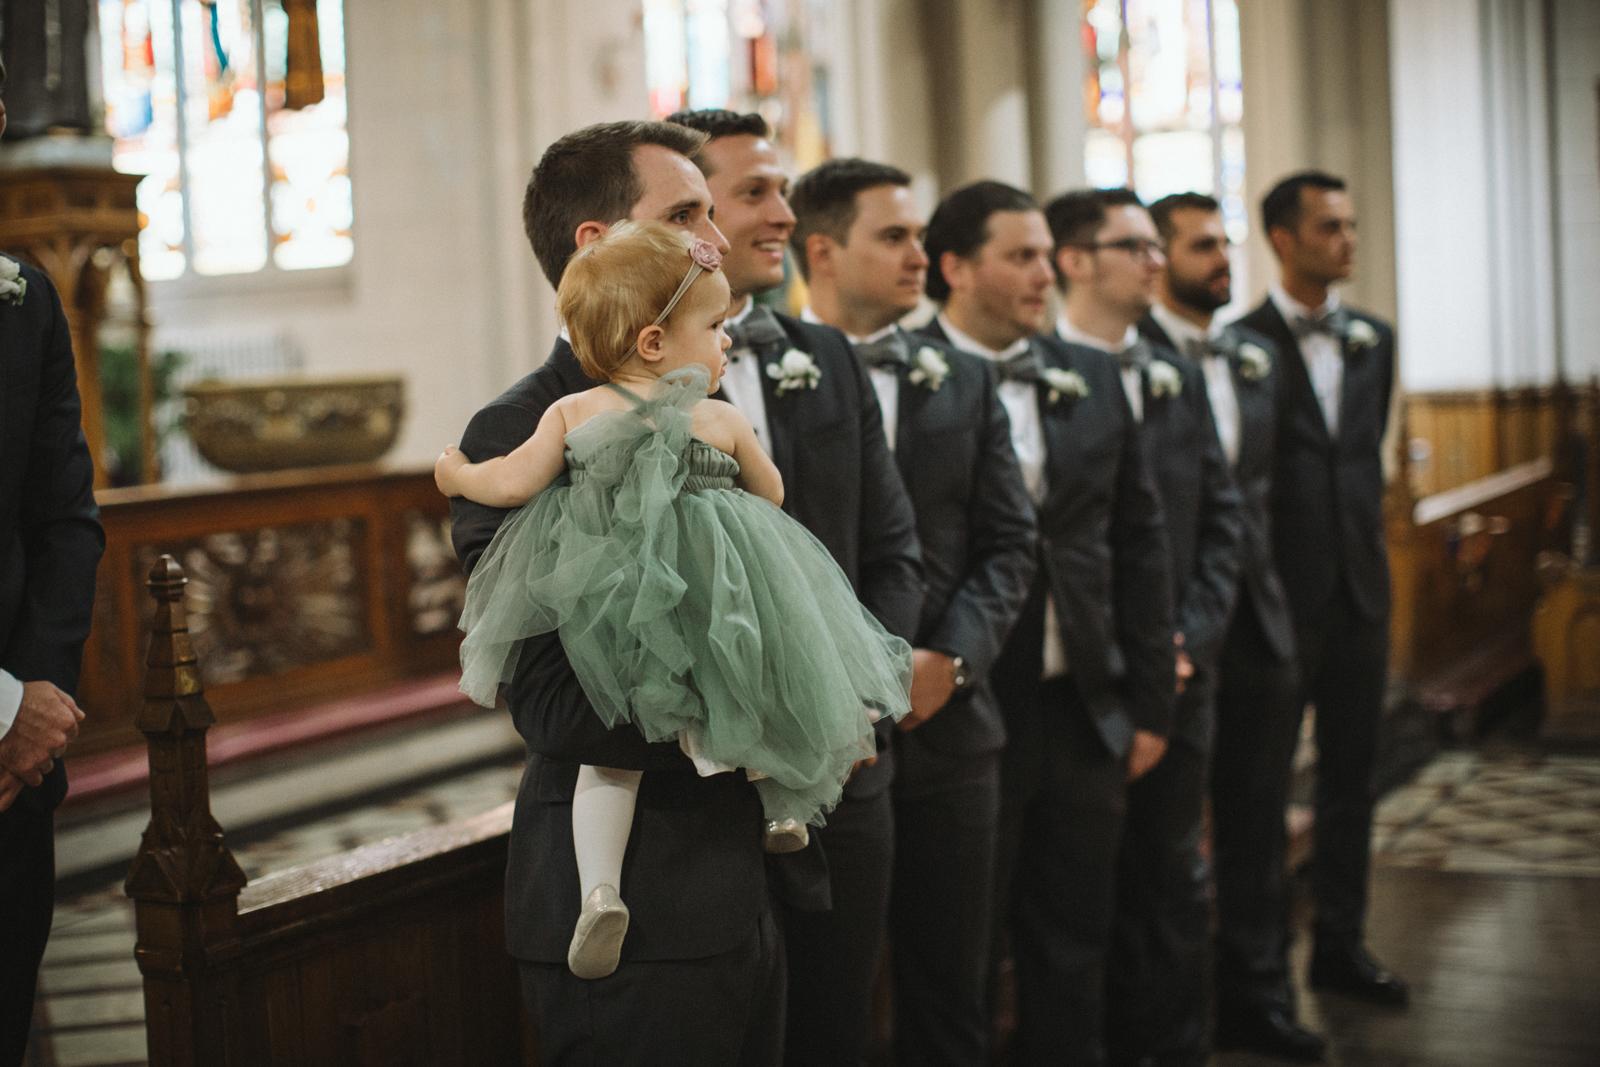 BeanandCole.com-Chris&JackieJohnson-Wedding-58.jpg